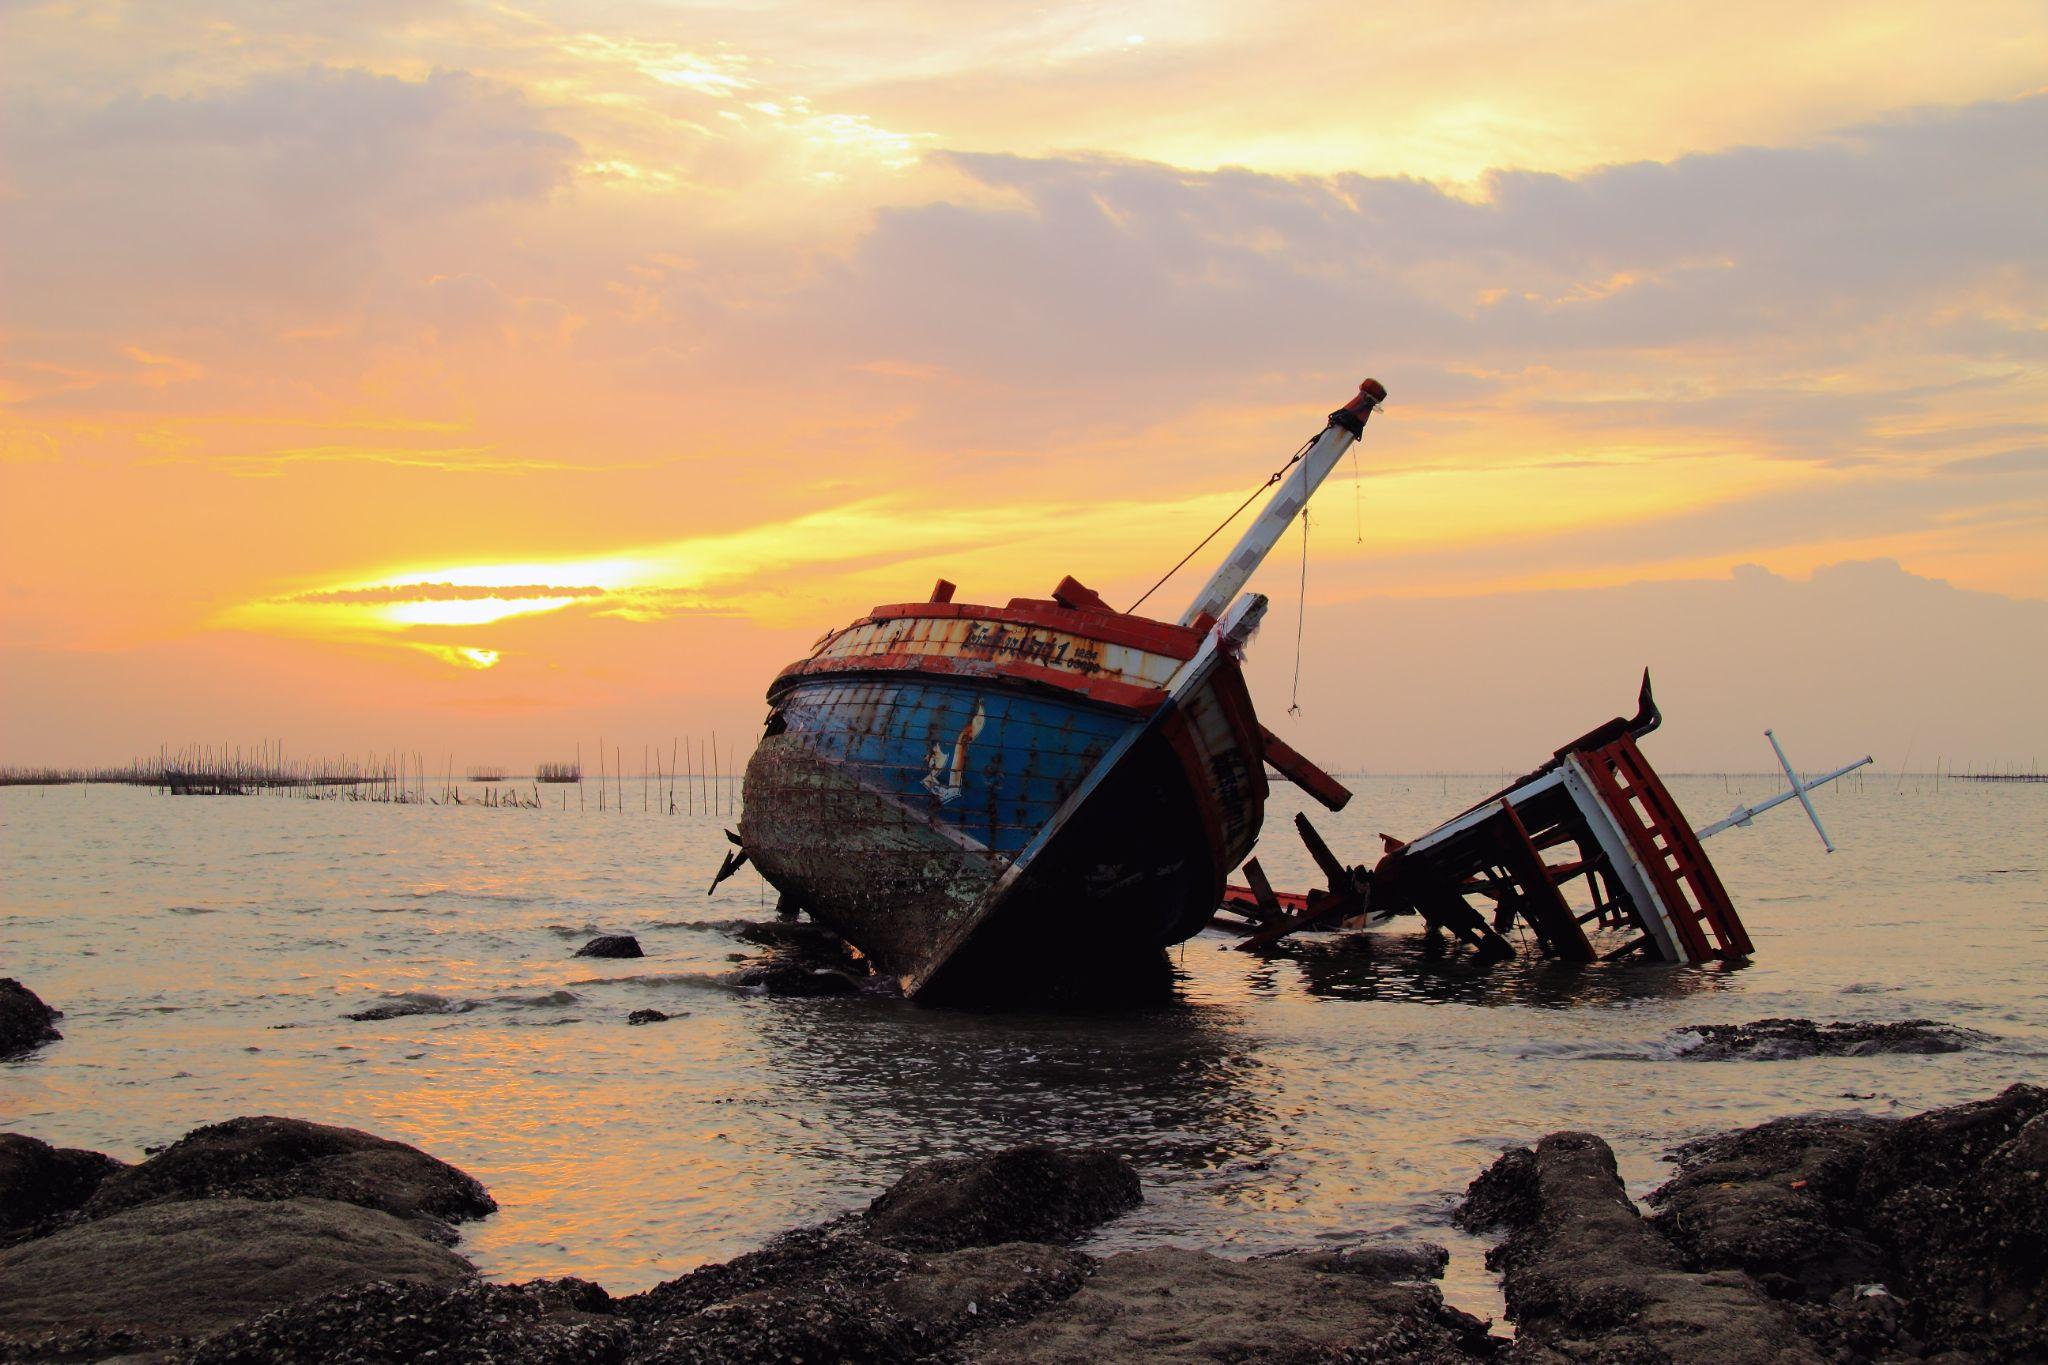 Shipwreck by kittipatboonchim